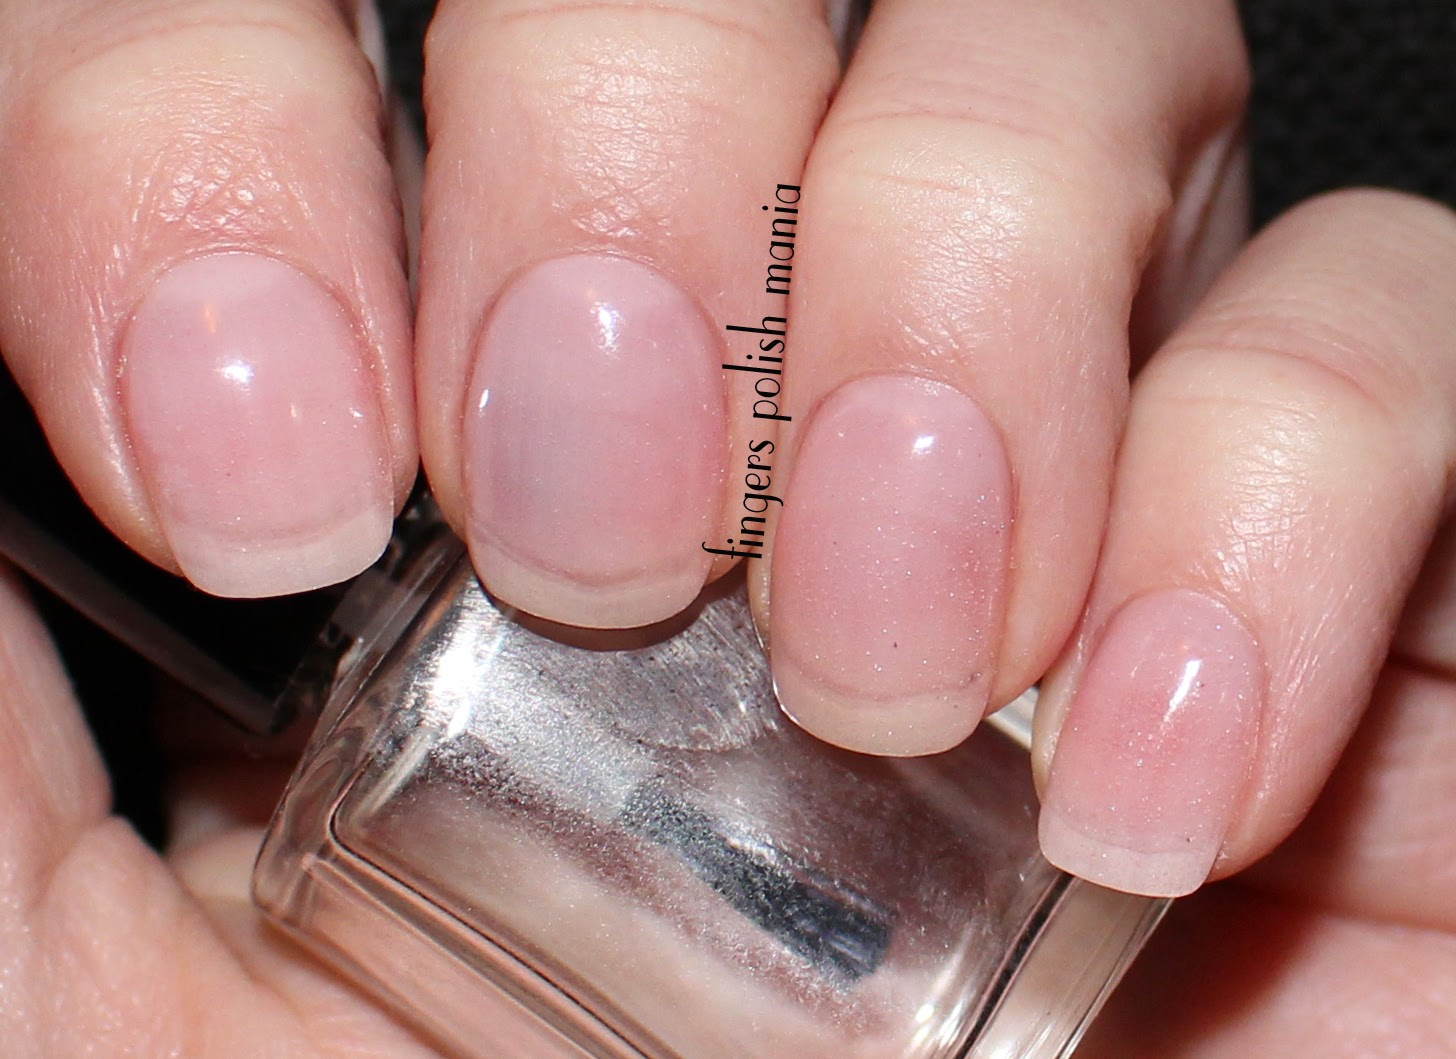 fingers polish mania: NexGen update, Enchanted Polish Djinn, OPI ...